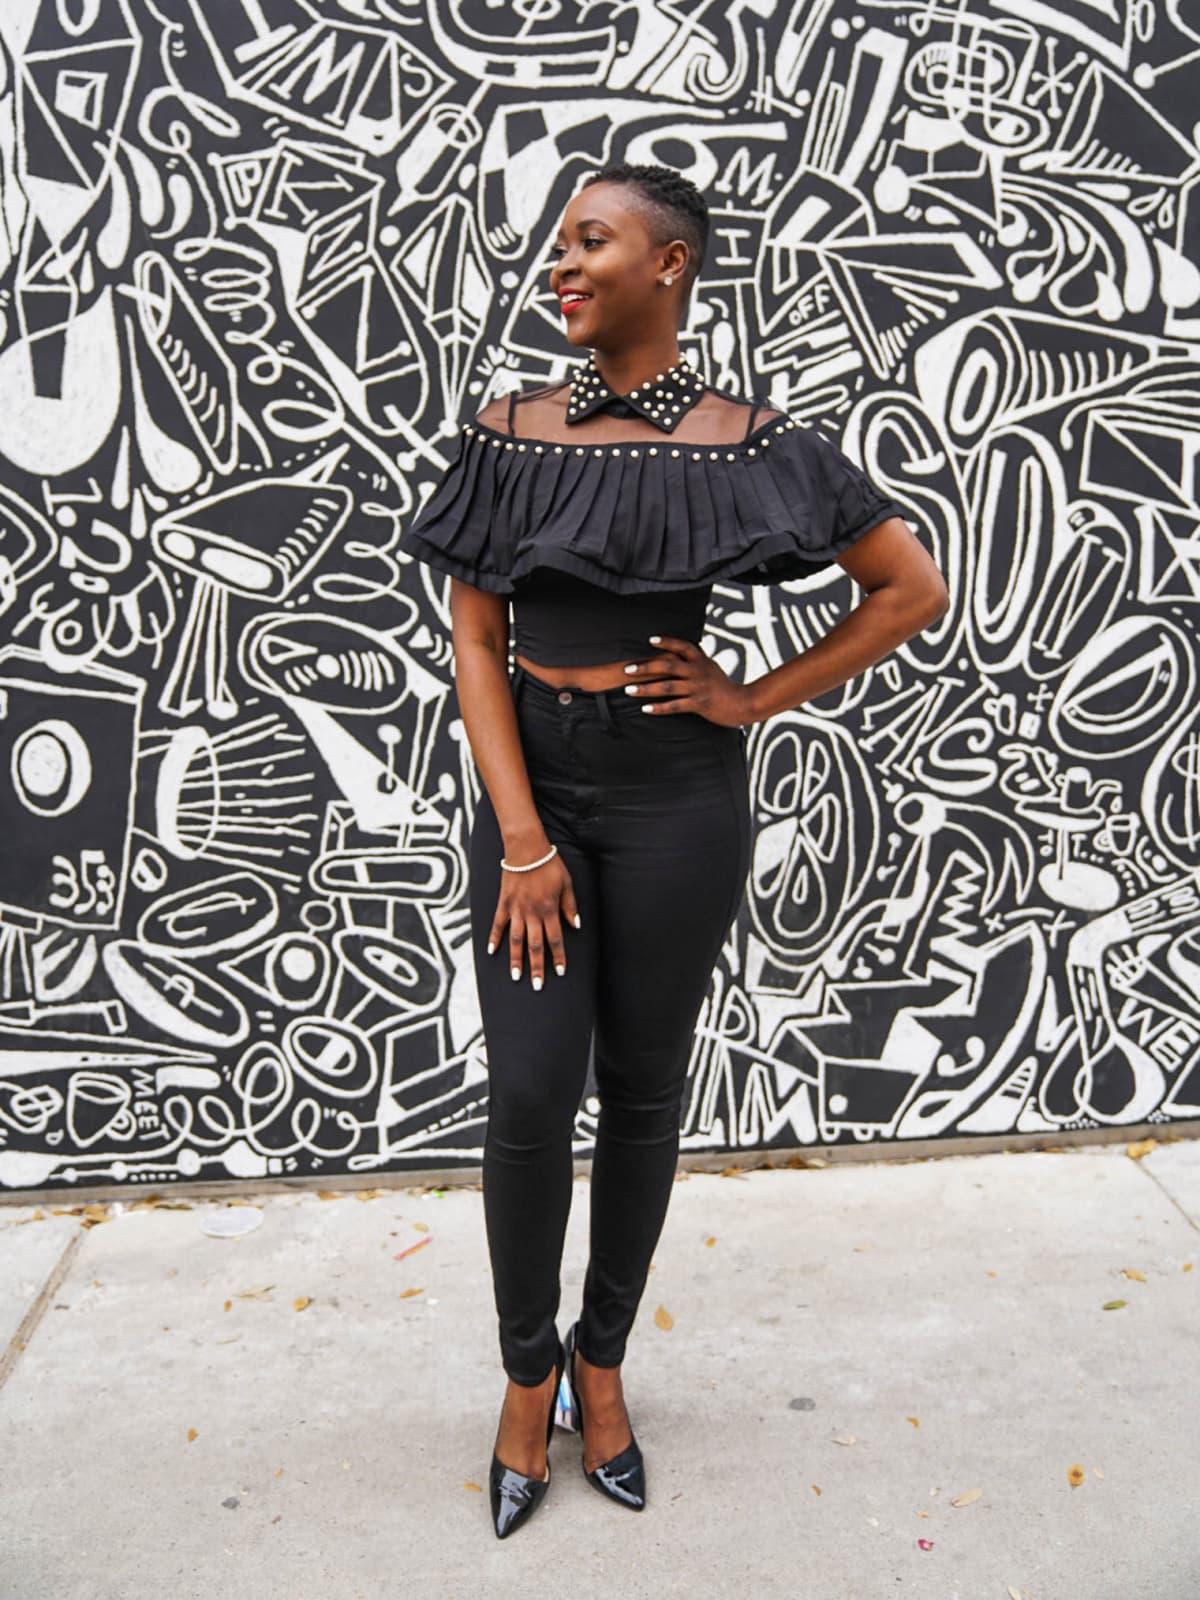 SXSW Street Style 2018 Brenda Orelus